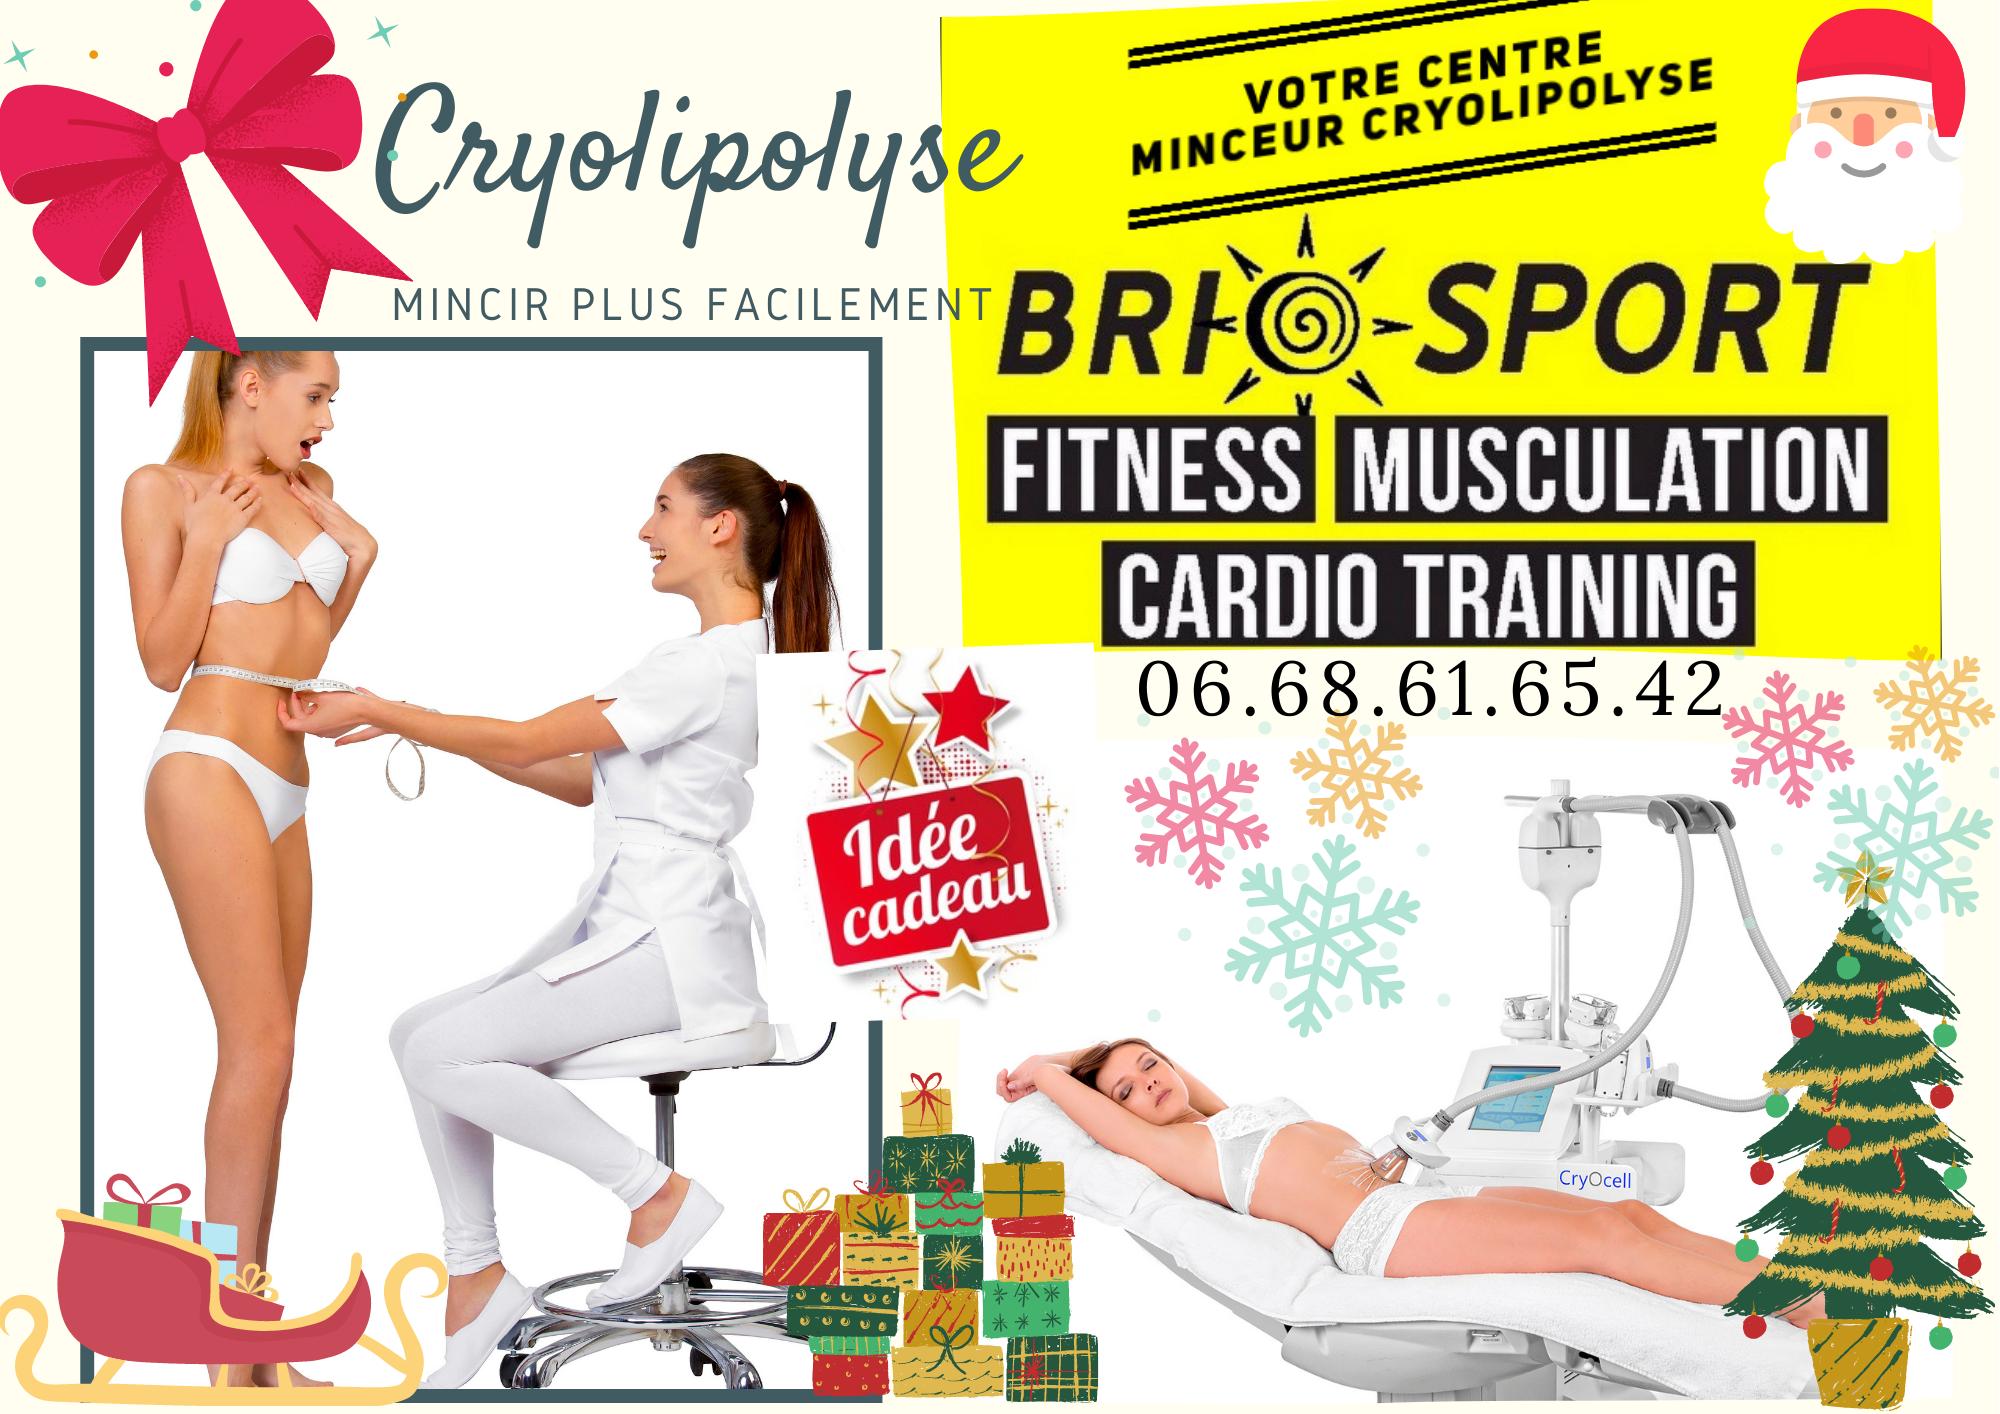 alle de Sport Fitness Musculation Cardio- Maigrir Cryolipolyse - Cryothérapie - Castres - Lagarrigue- Labrugiere- Valdurenque- Mazamet- Bien être